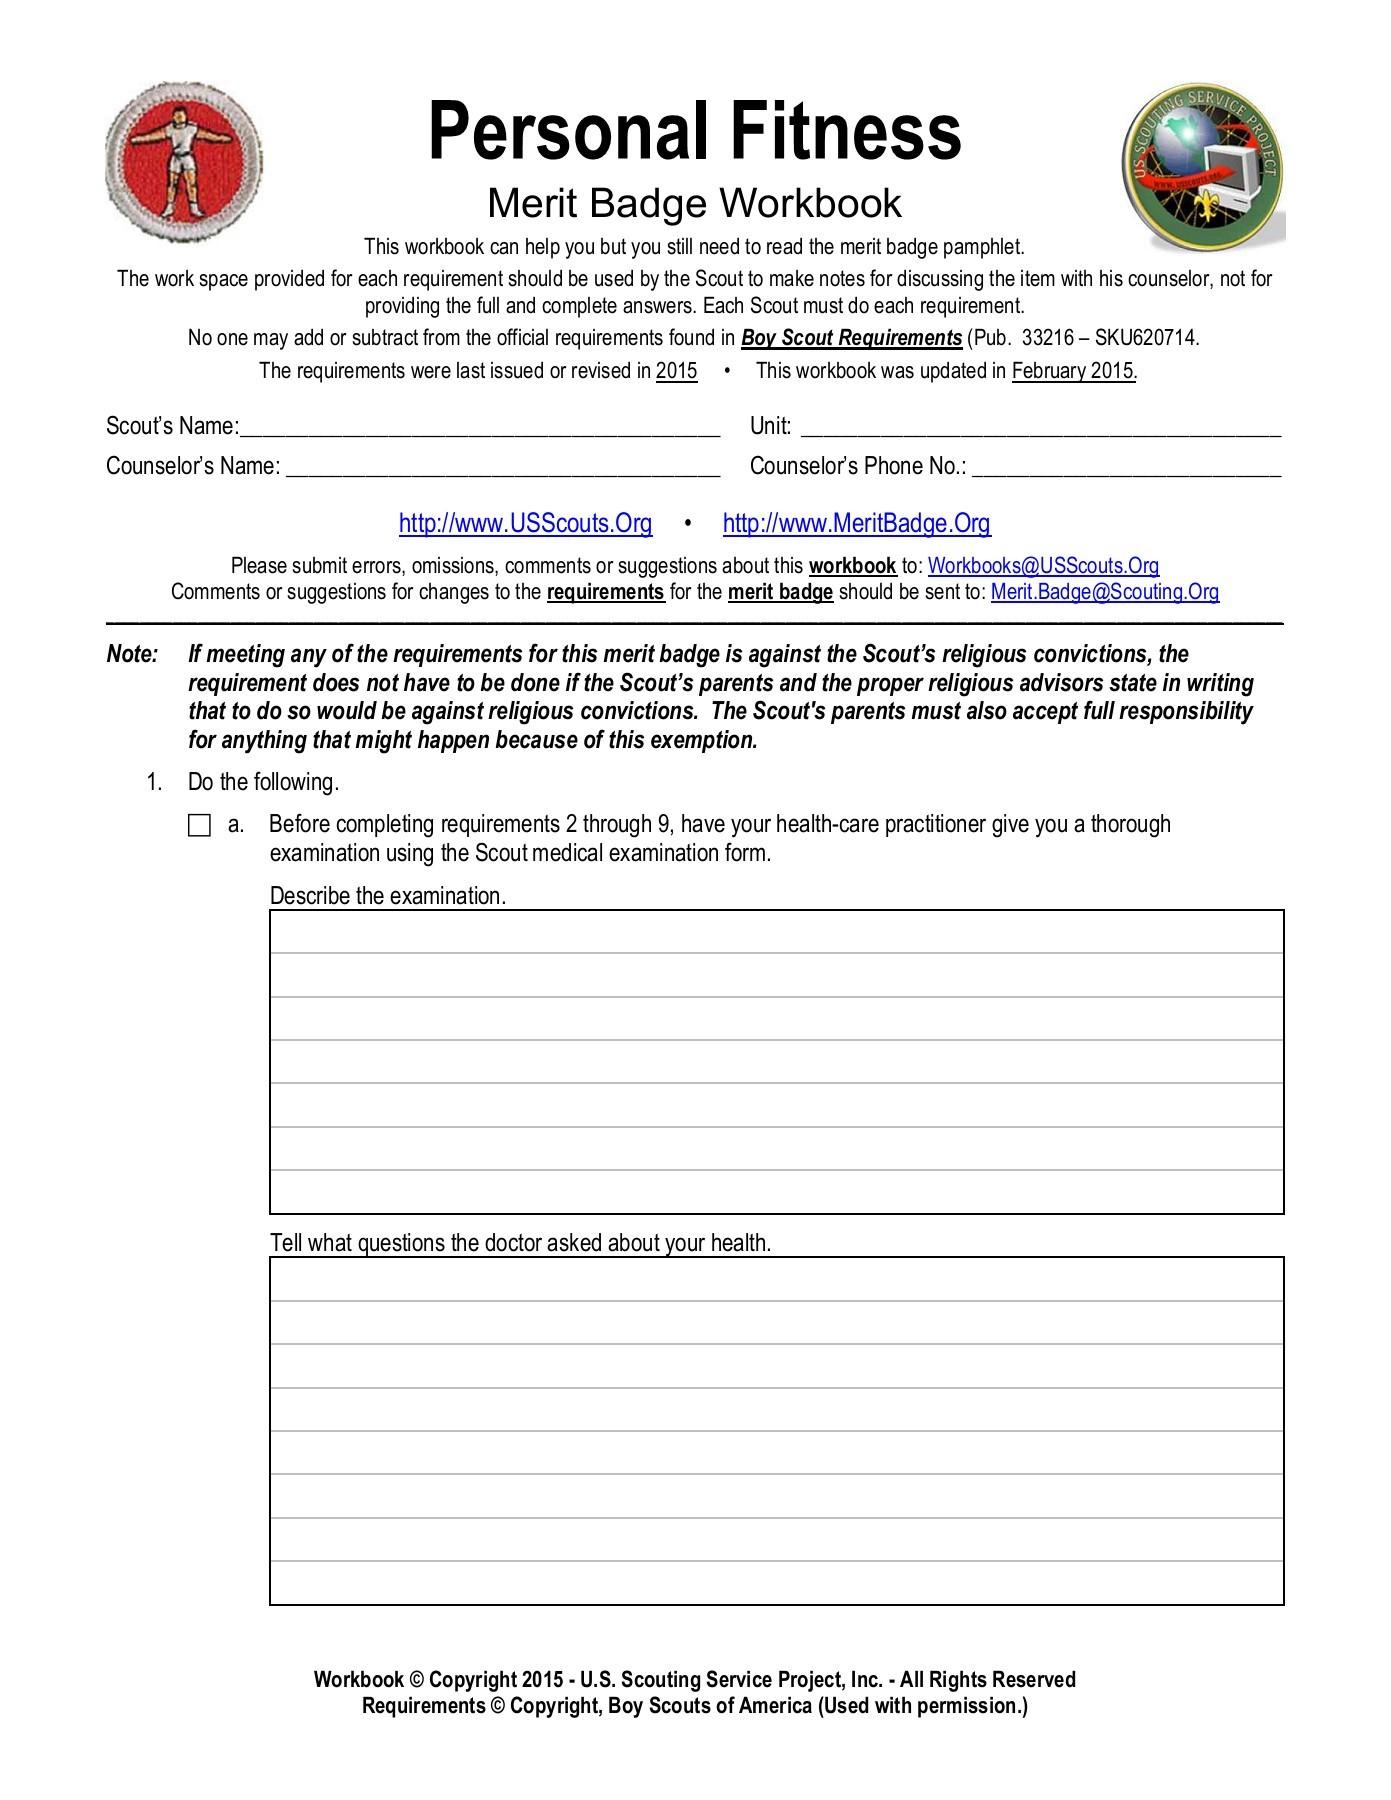 Personal Fitness Merit Badge Worksheet